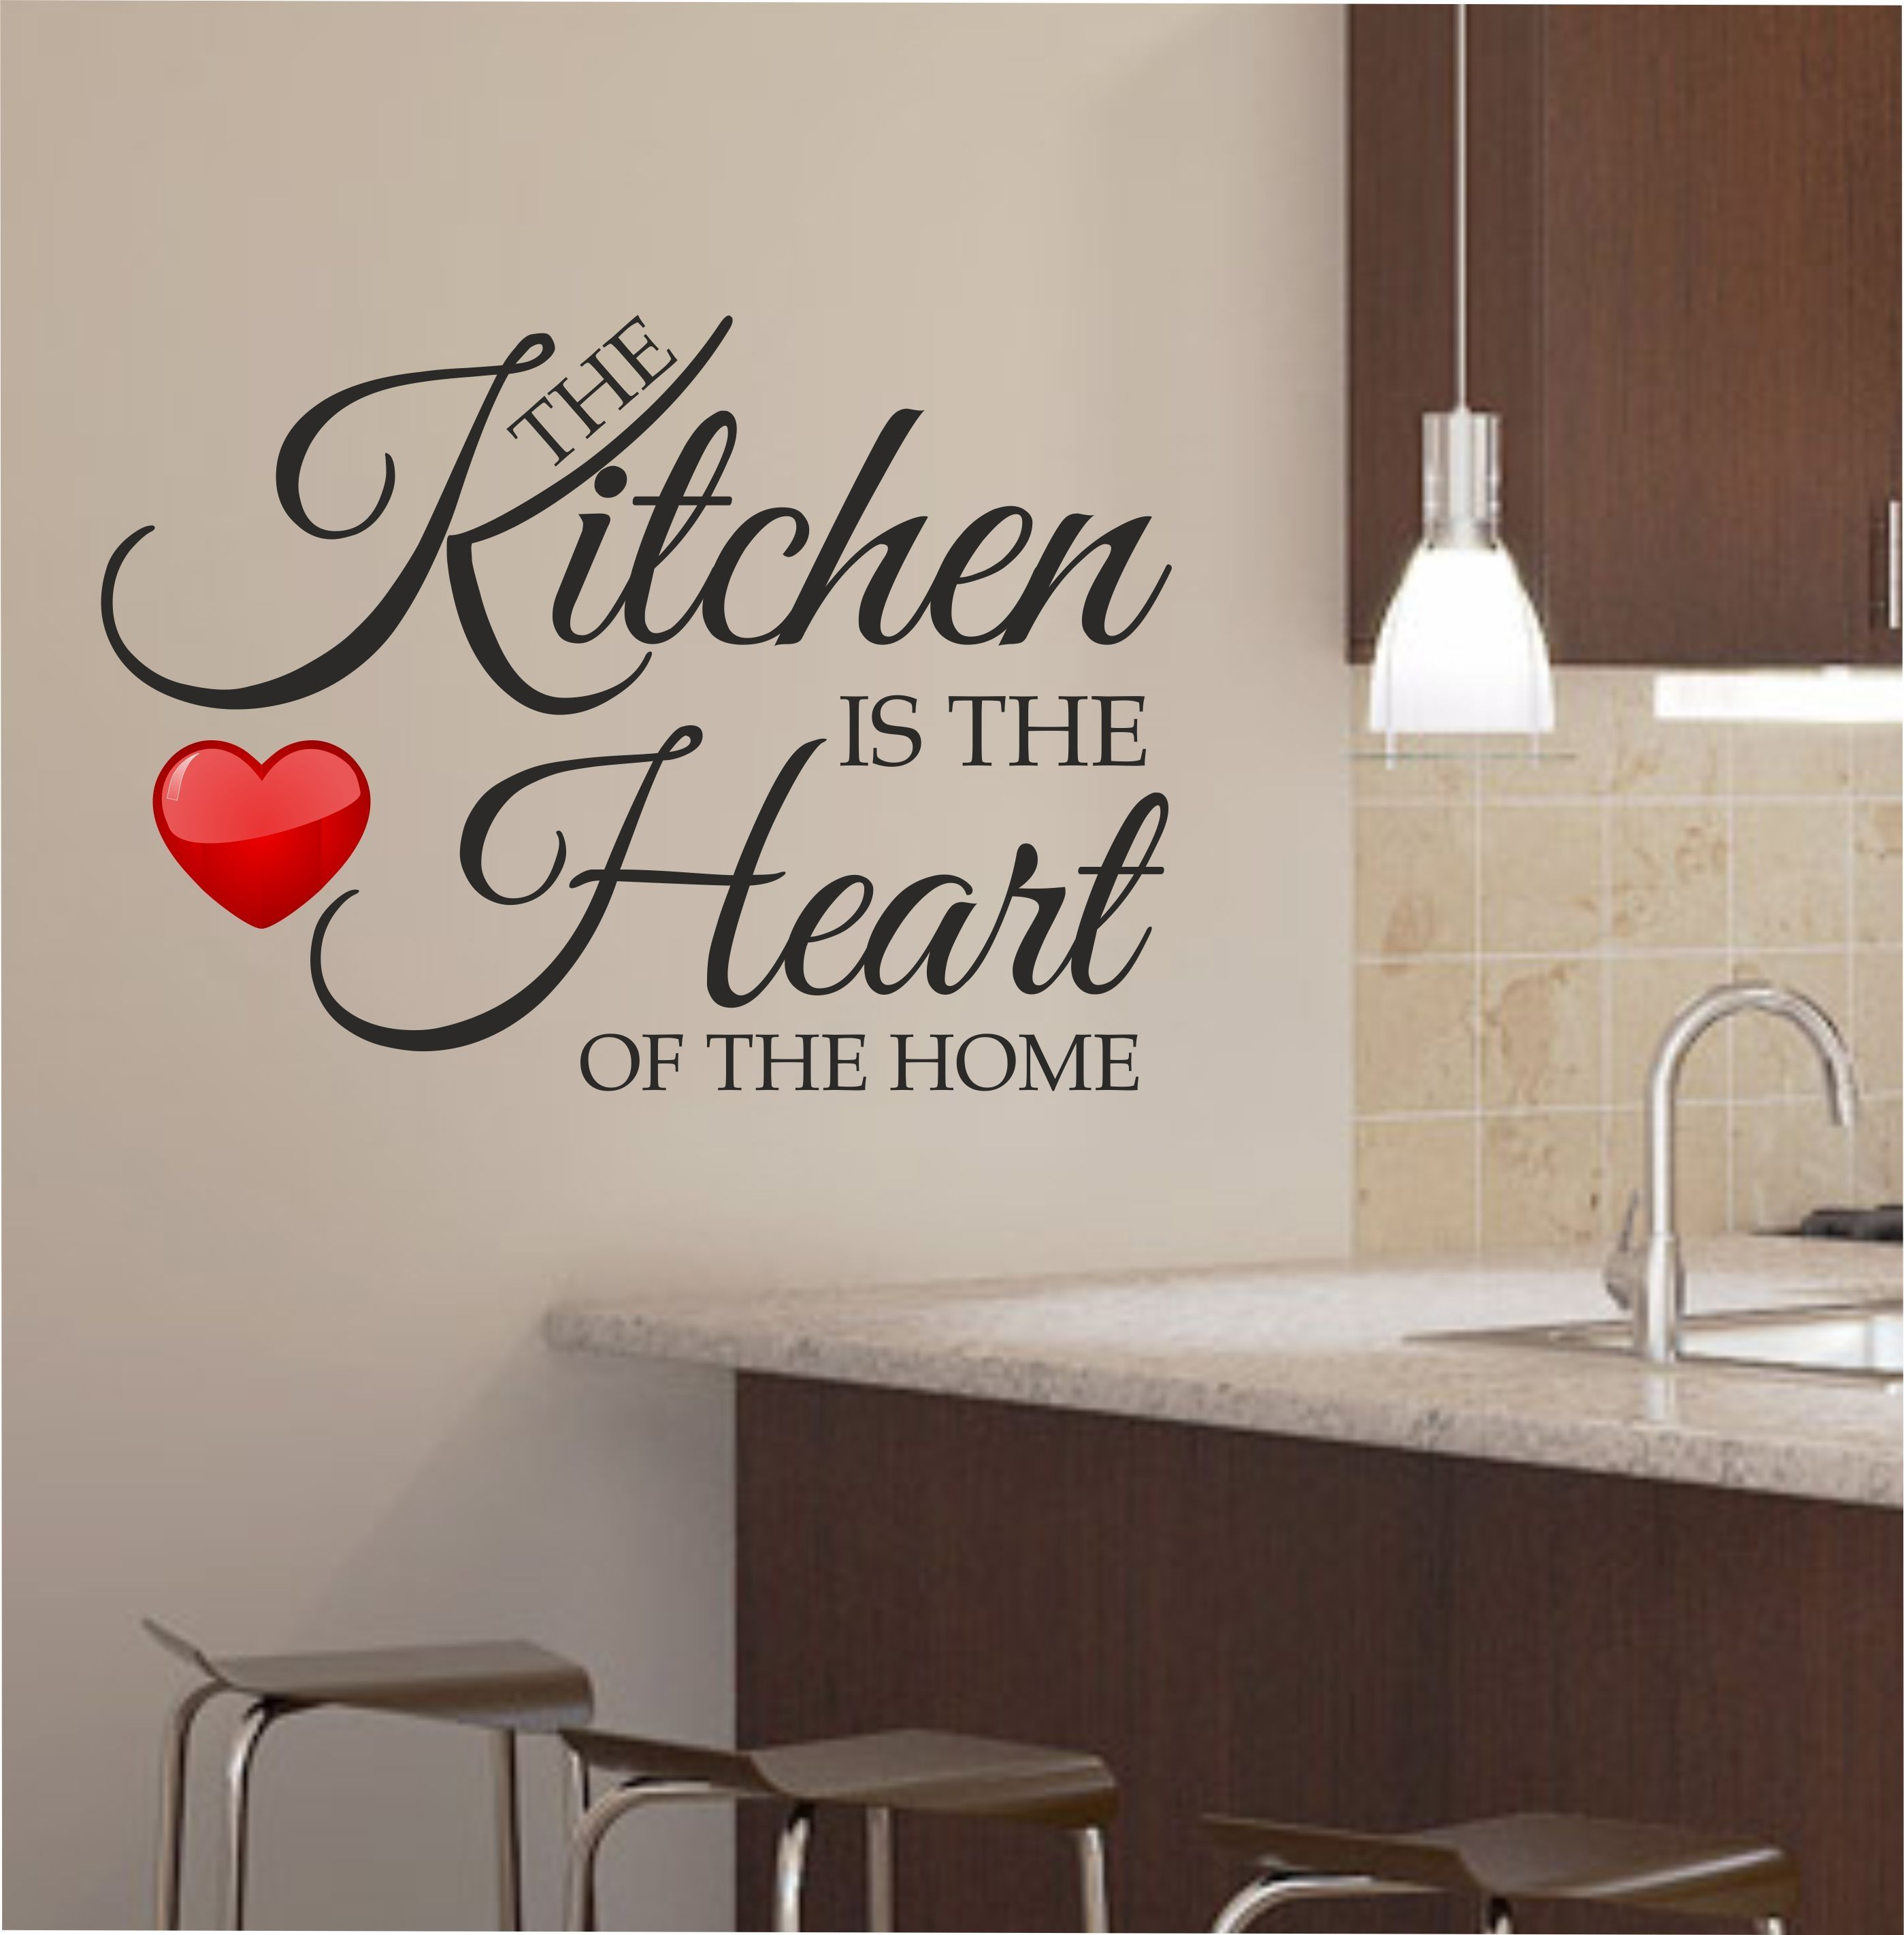 Kitchen wall art decorating ideas umadepa pinterest